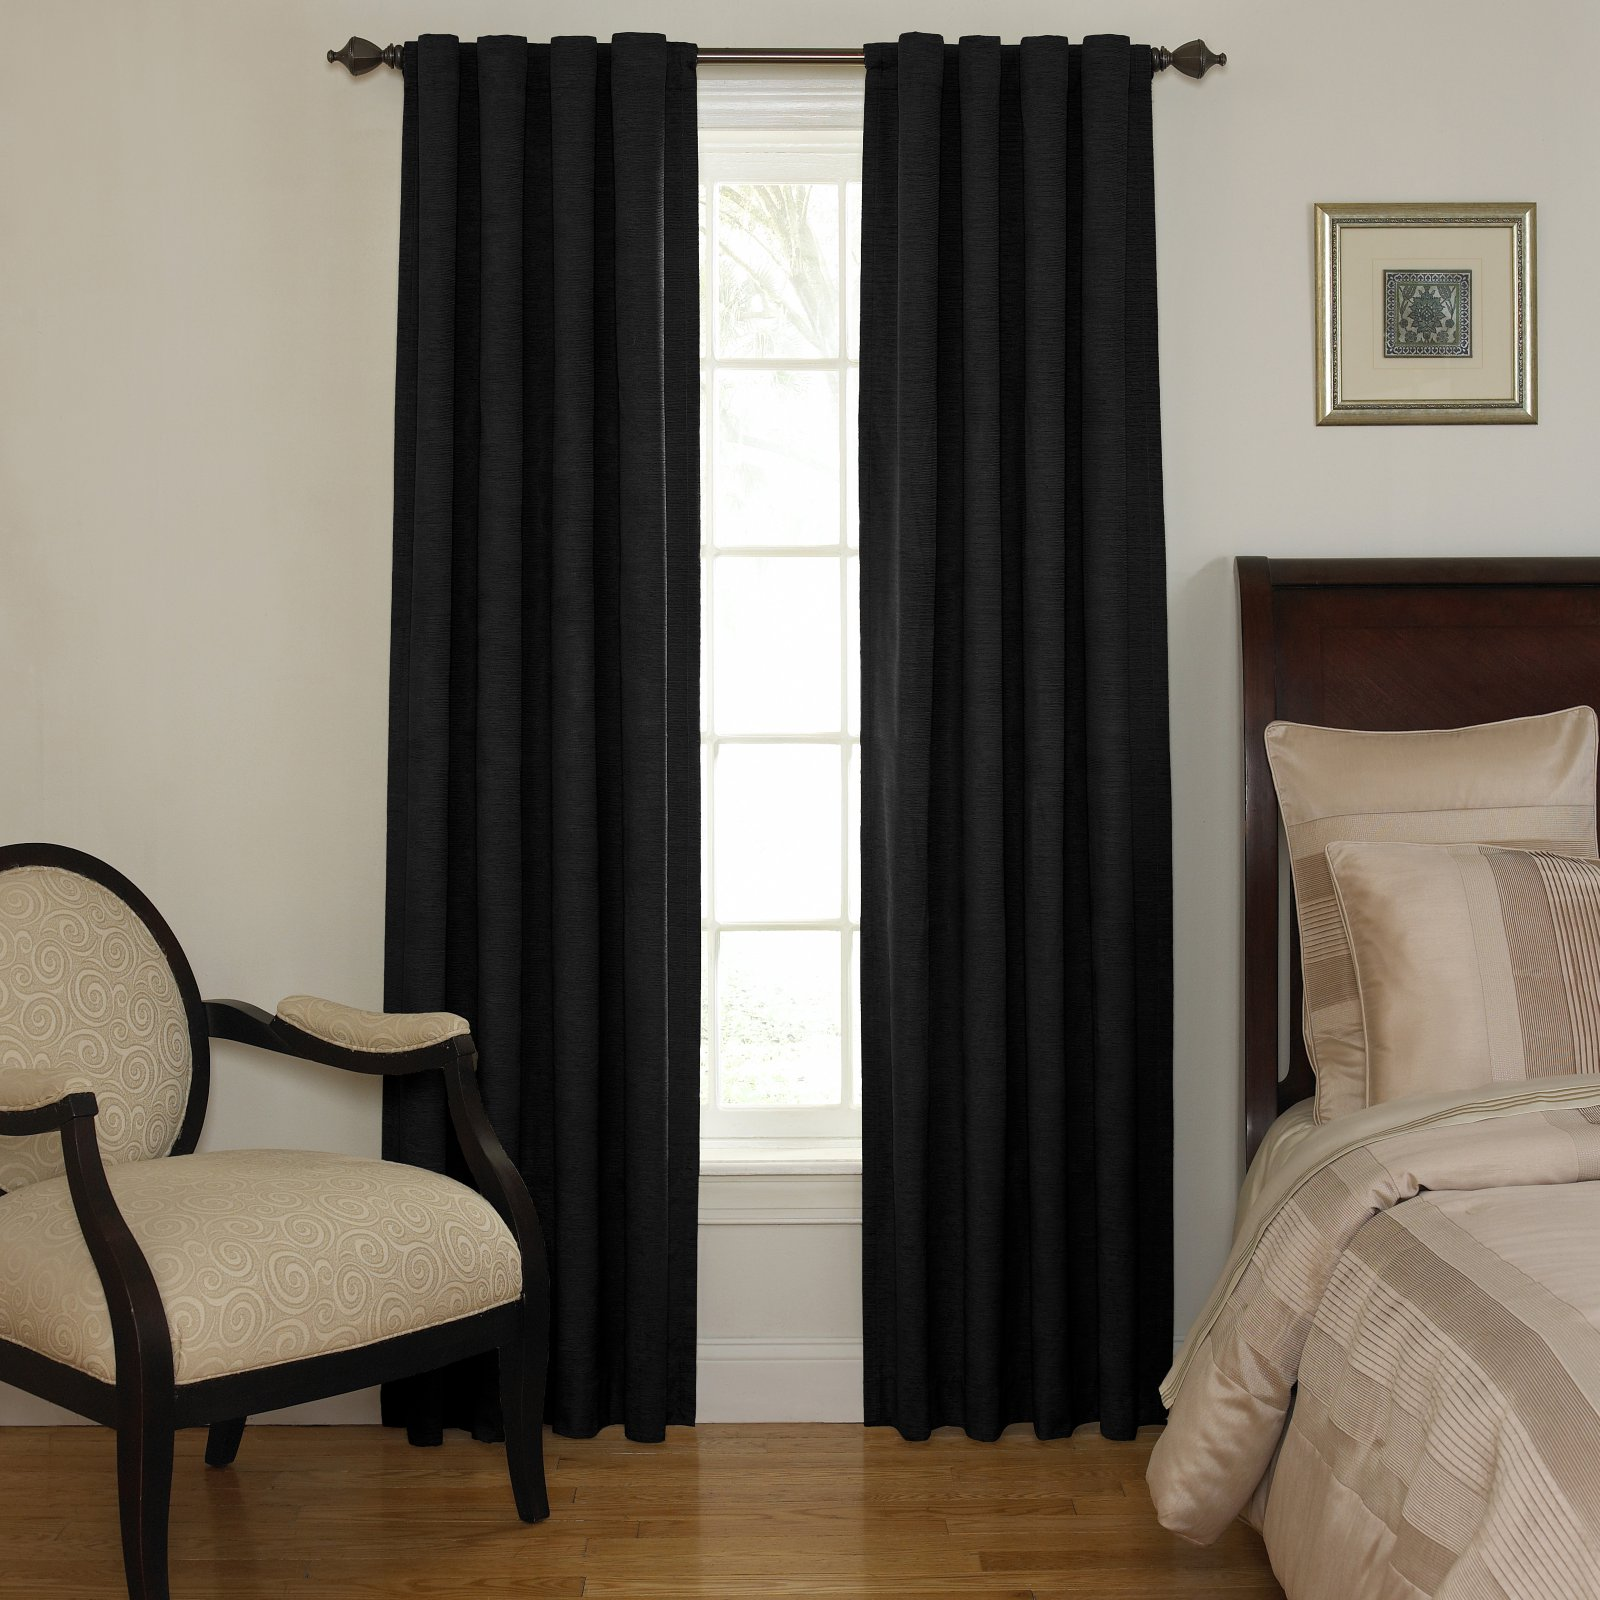 Beautyrest Room-Darkening Backtab Window Curtain Panel